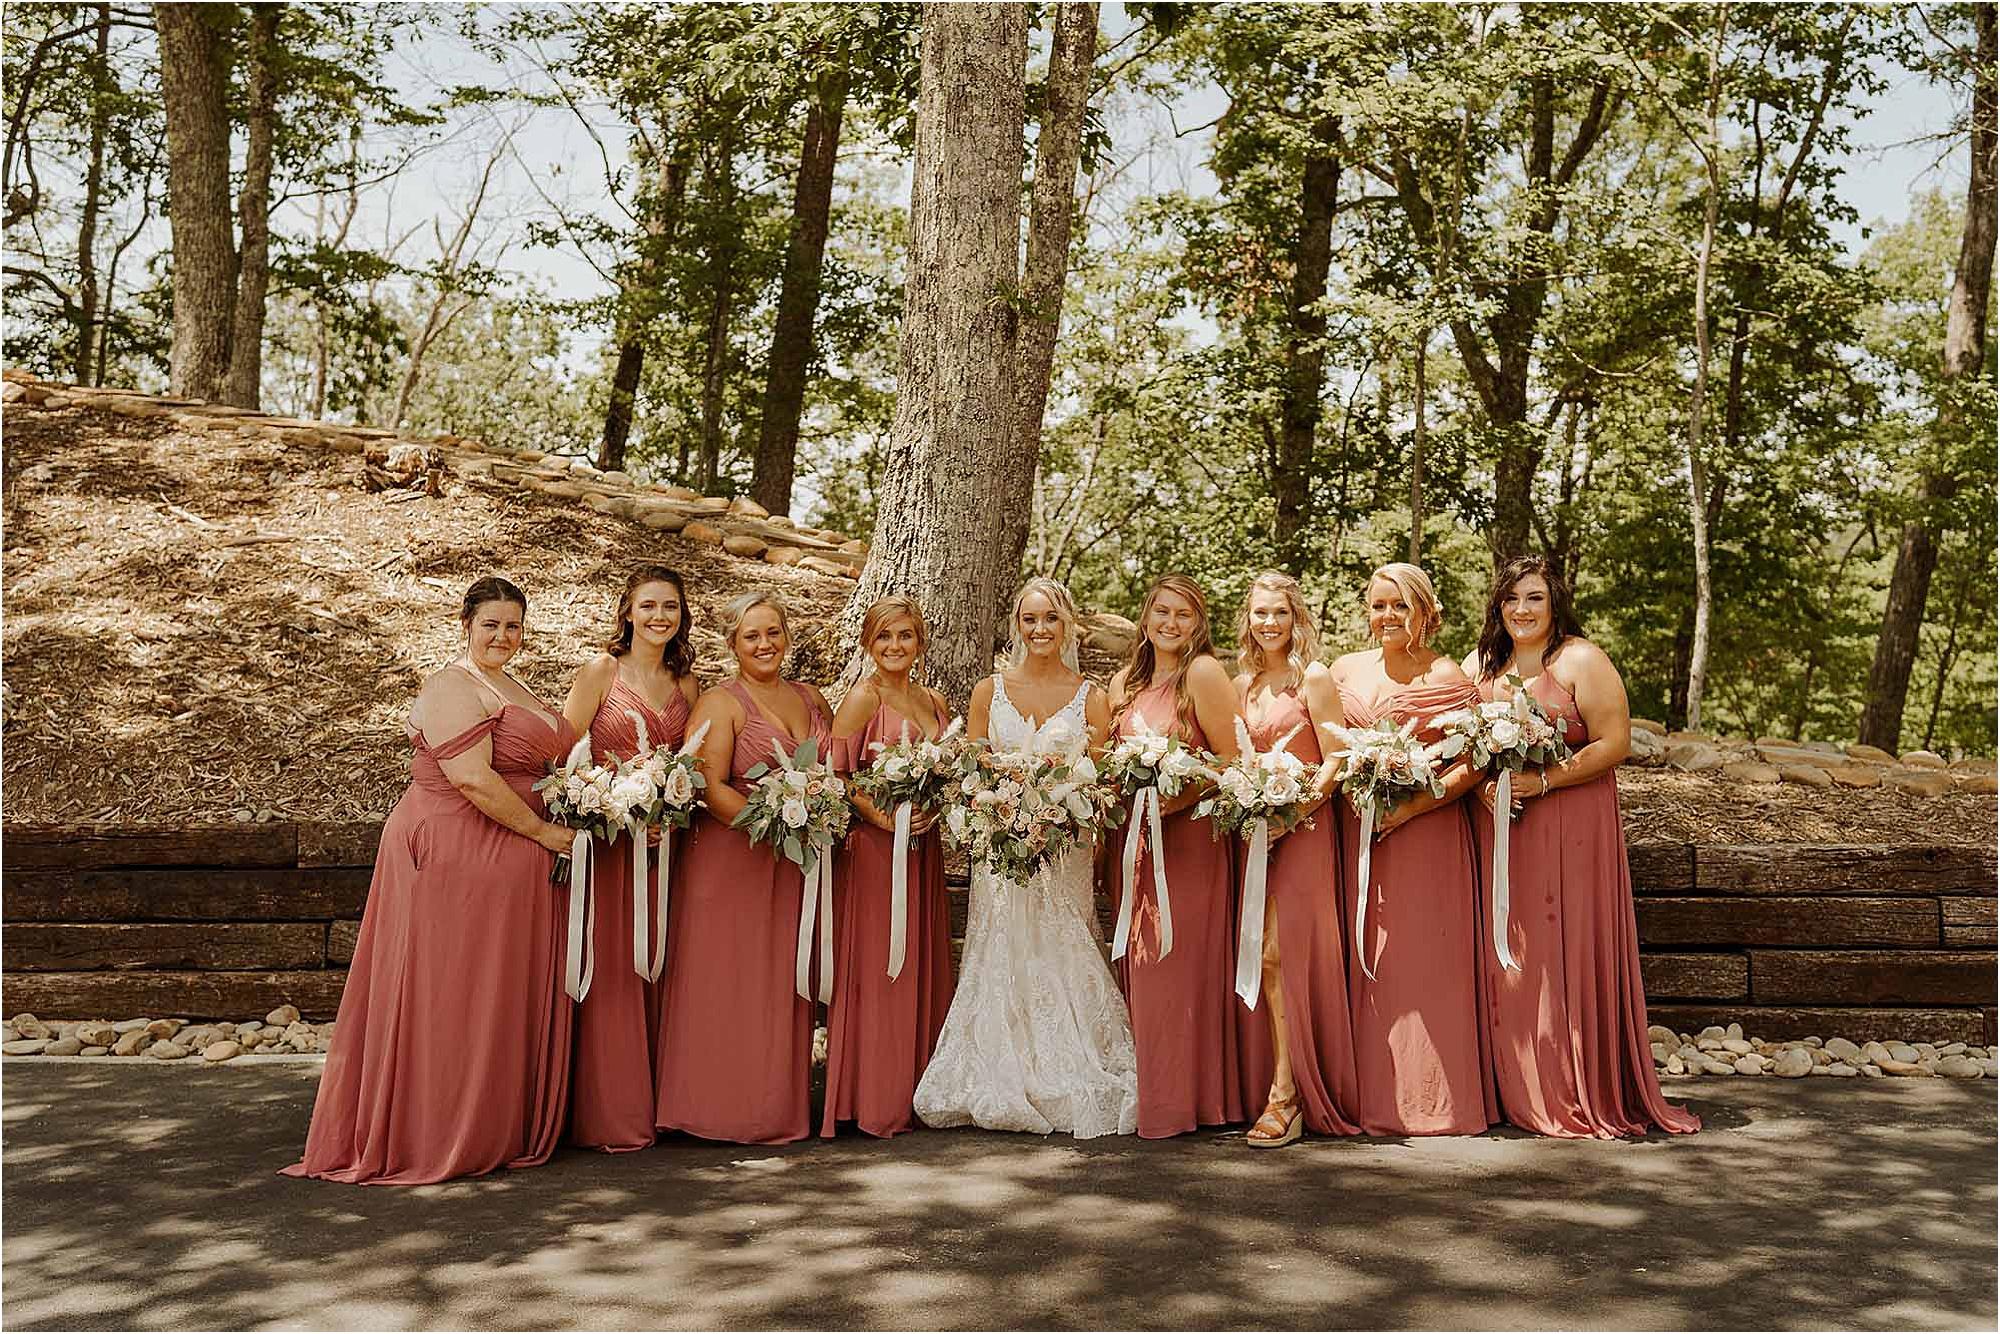 bride and bridesmaids in blush bridesmaids dresses